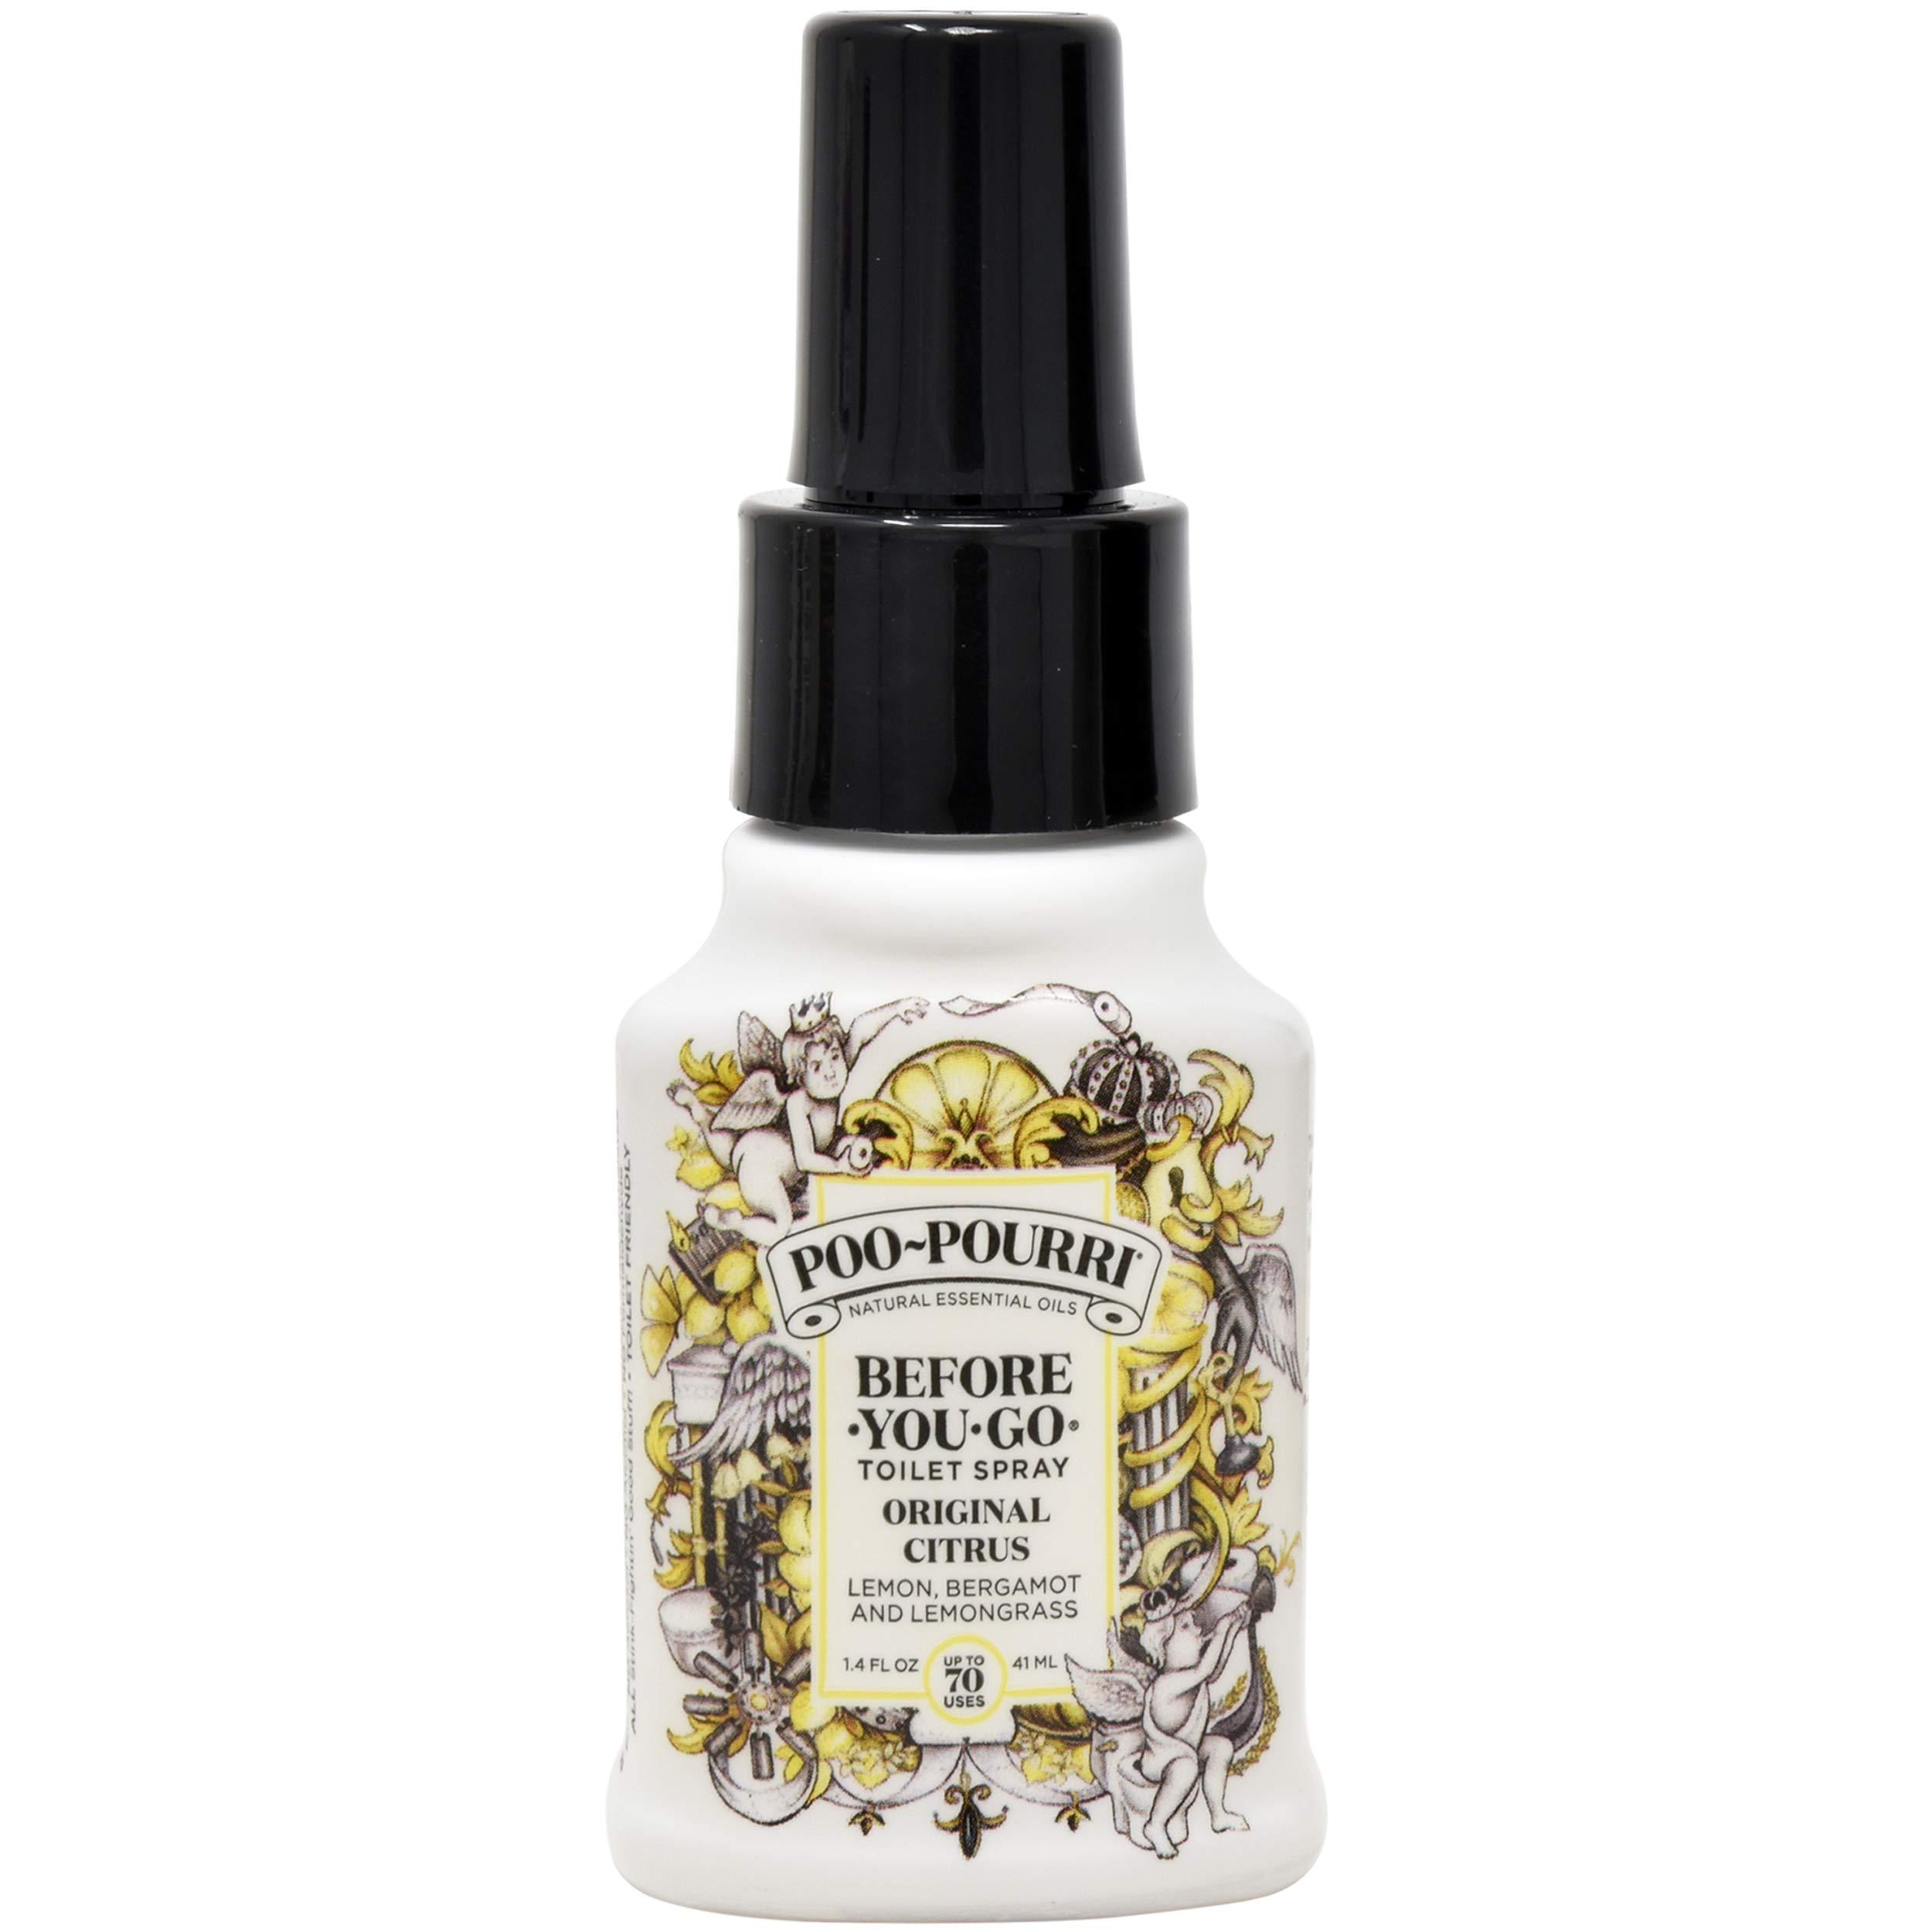 Poo-Pourri Vanilla Mint 4 Ounce, Tropical Hibiscus 1.4 Ounce and Original Citrus 1.4 Ounce by Poo-Pourri (Image #4)